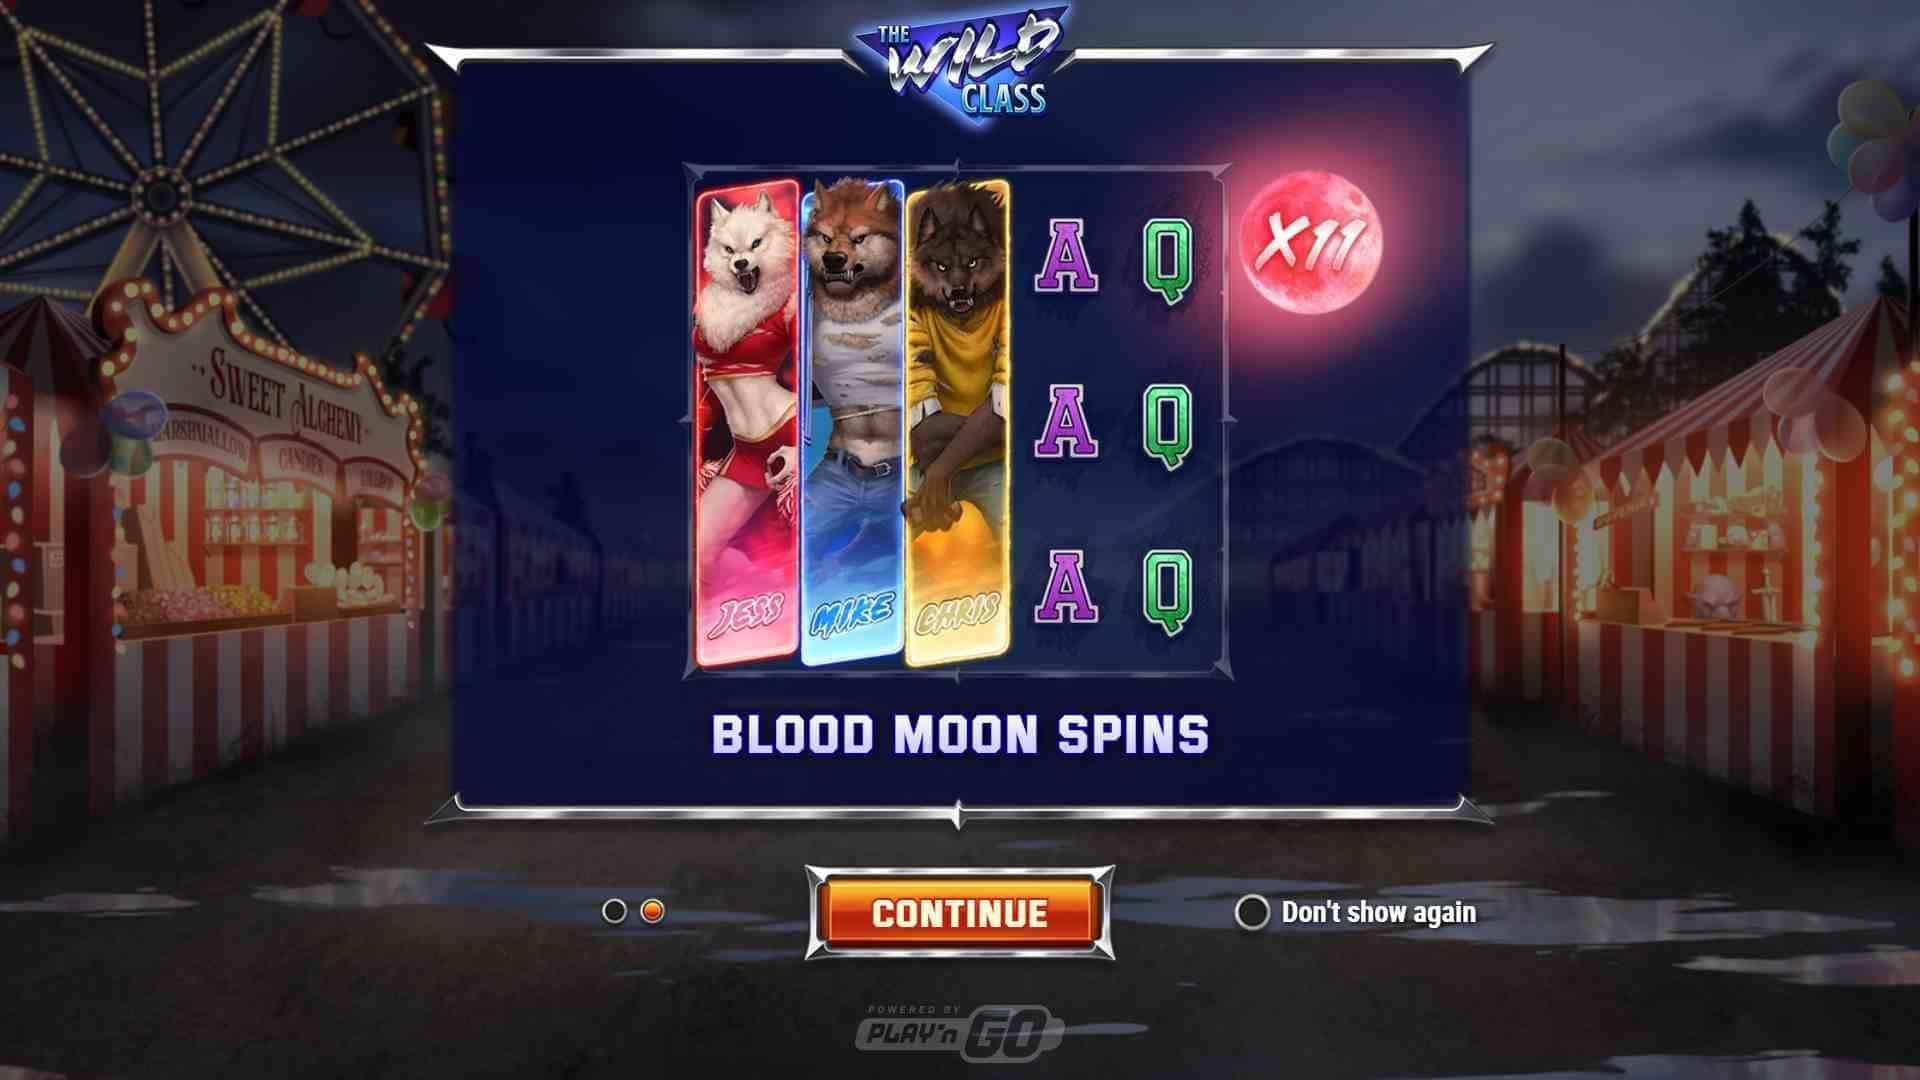 The Wild Class Slot Gameplay